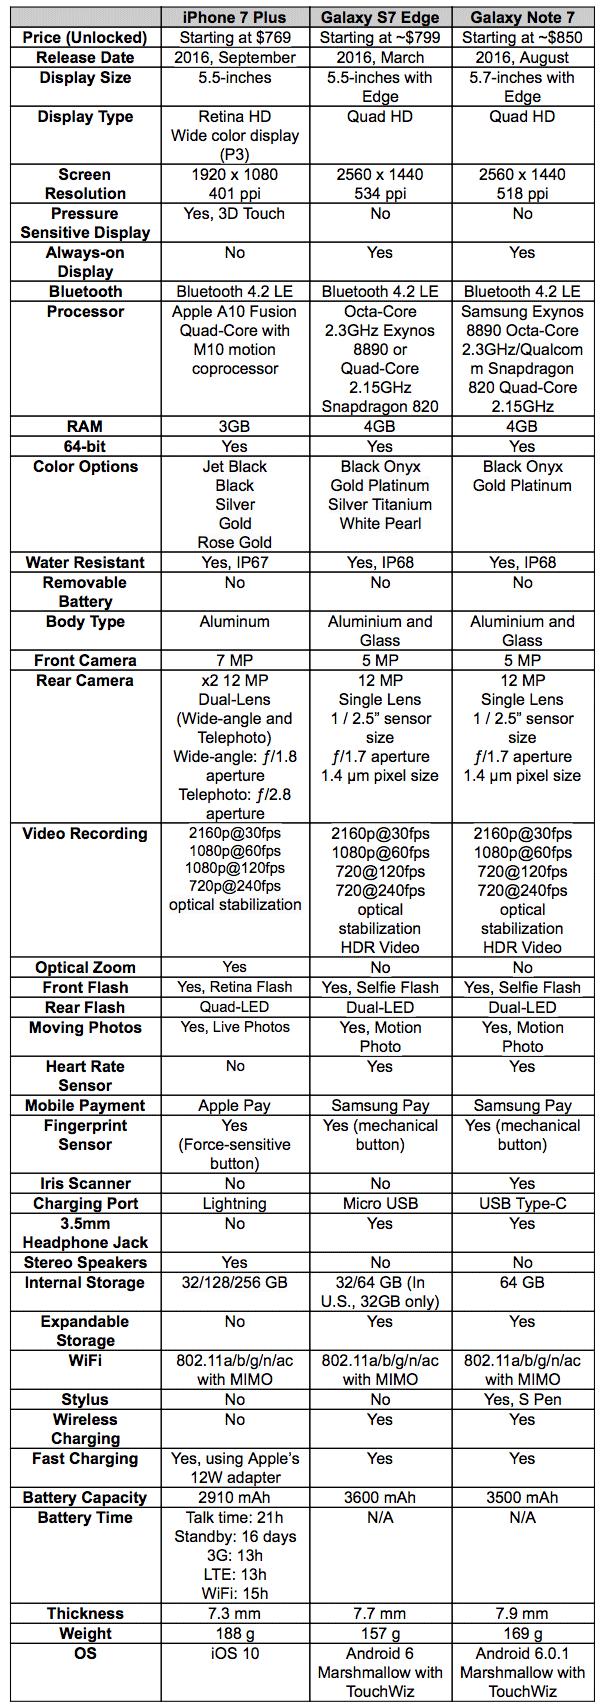 iPhone siete Plus vs Galaxy™ S7 vs Galaxy™ Note 7